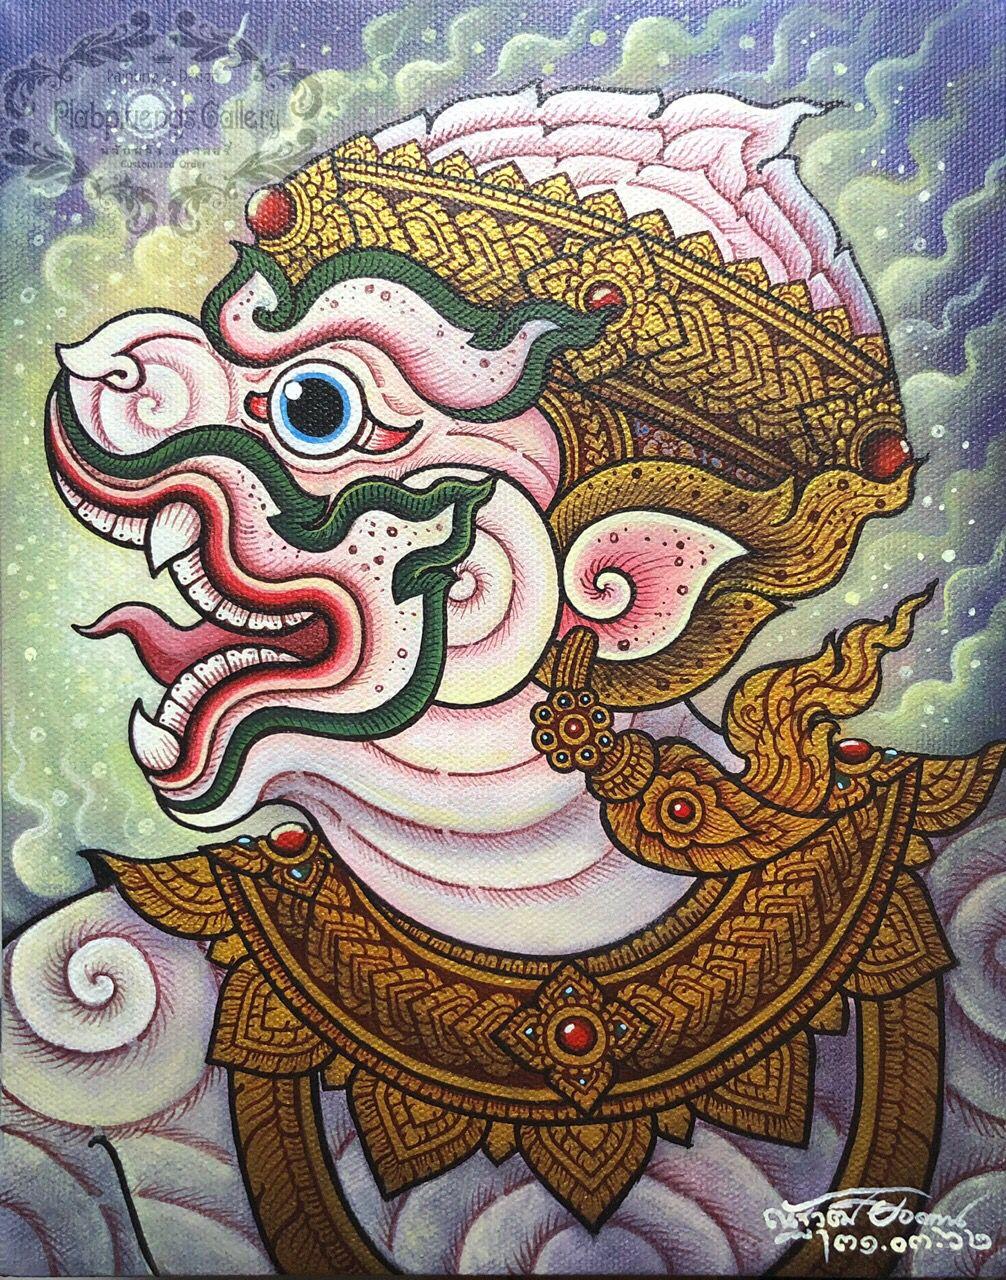 Plabpluengsgallery Artwork Artlover Artgallery Kunsthandwerk Thaiart Hanuman Hinduism Art Acrylmalerei Acrylpainting Pa ศ ลปะเคลต ก ภาพวาด ภาพศ ลป